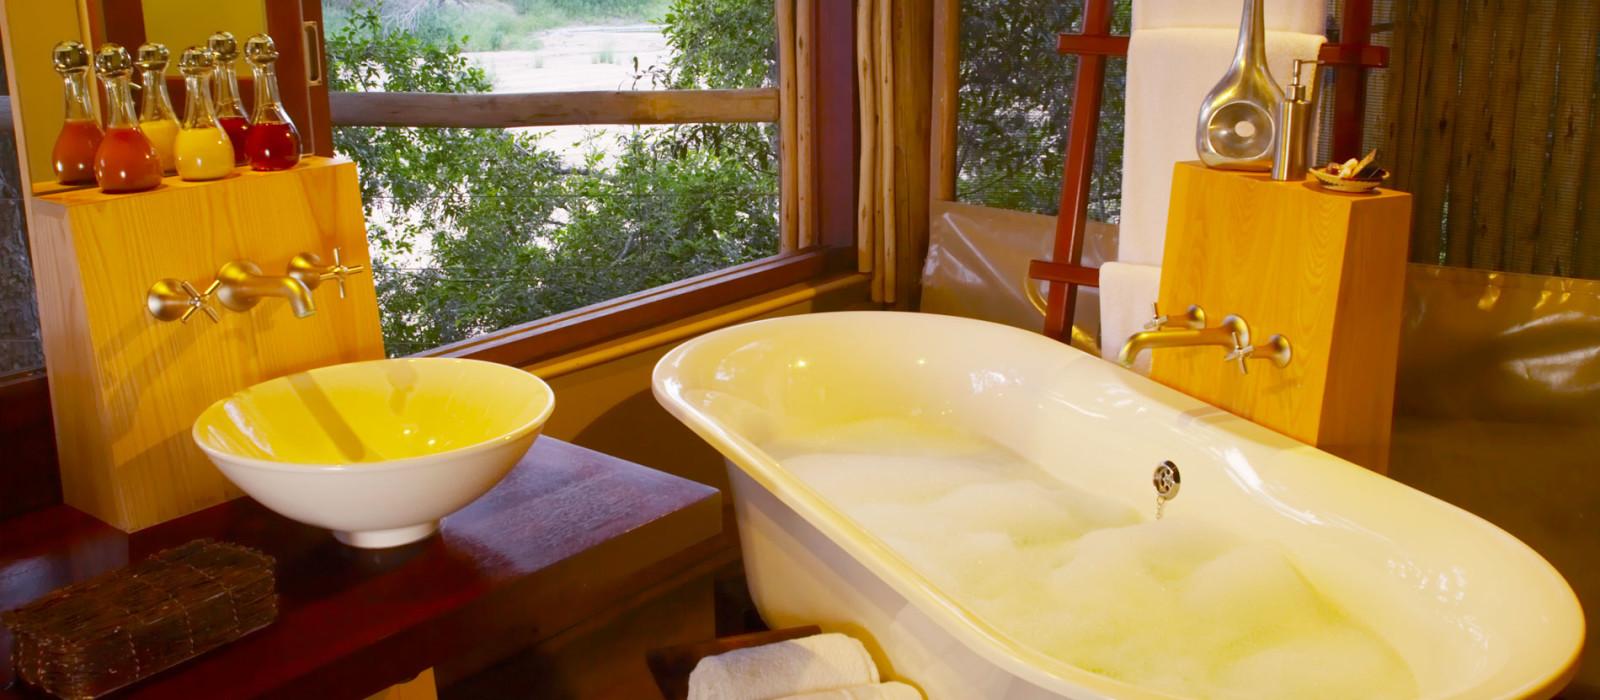 Hotel Rhino Post Safari Lodge South Africa